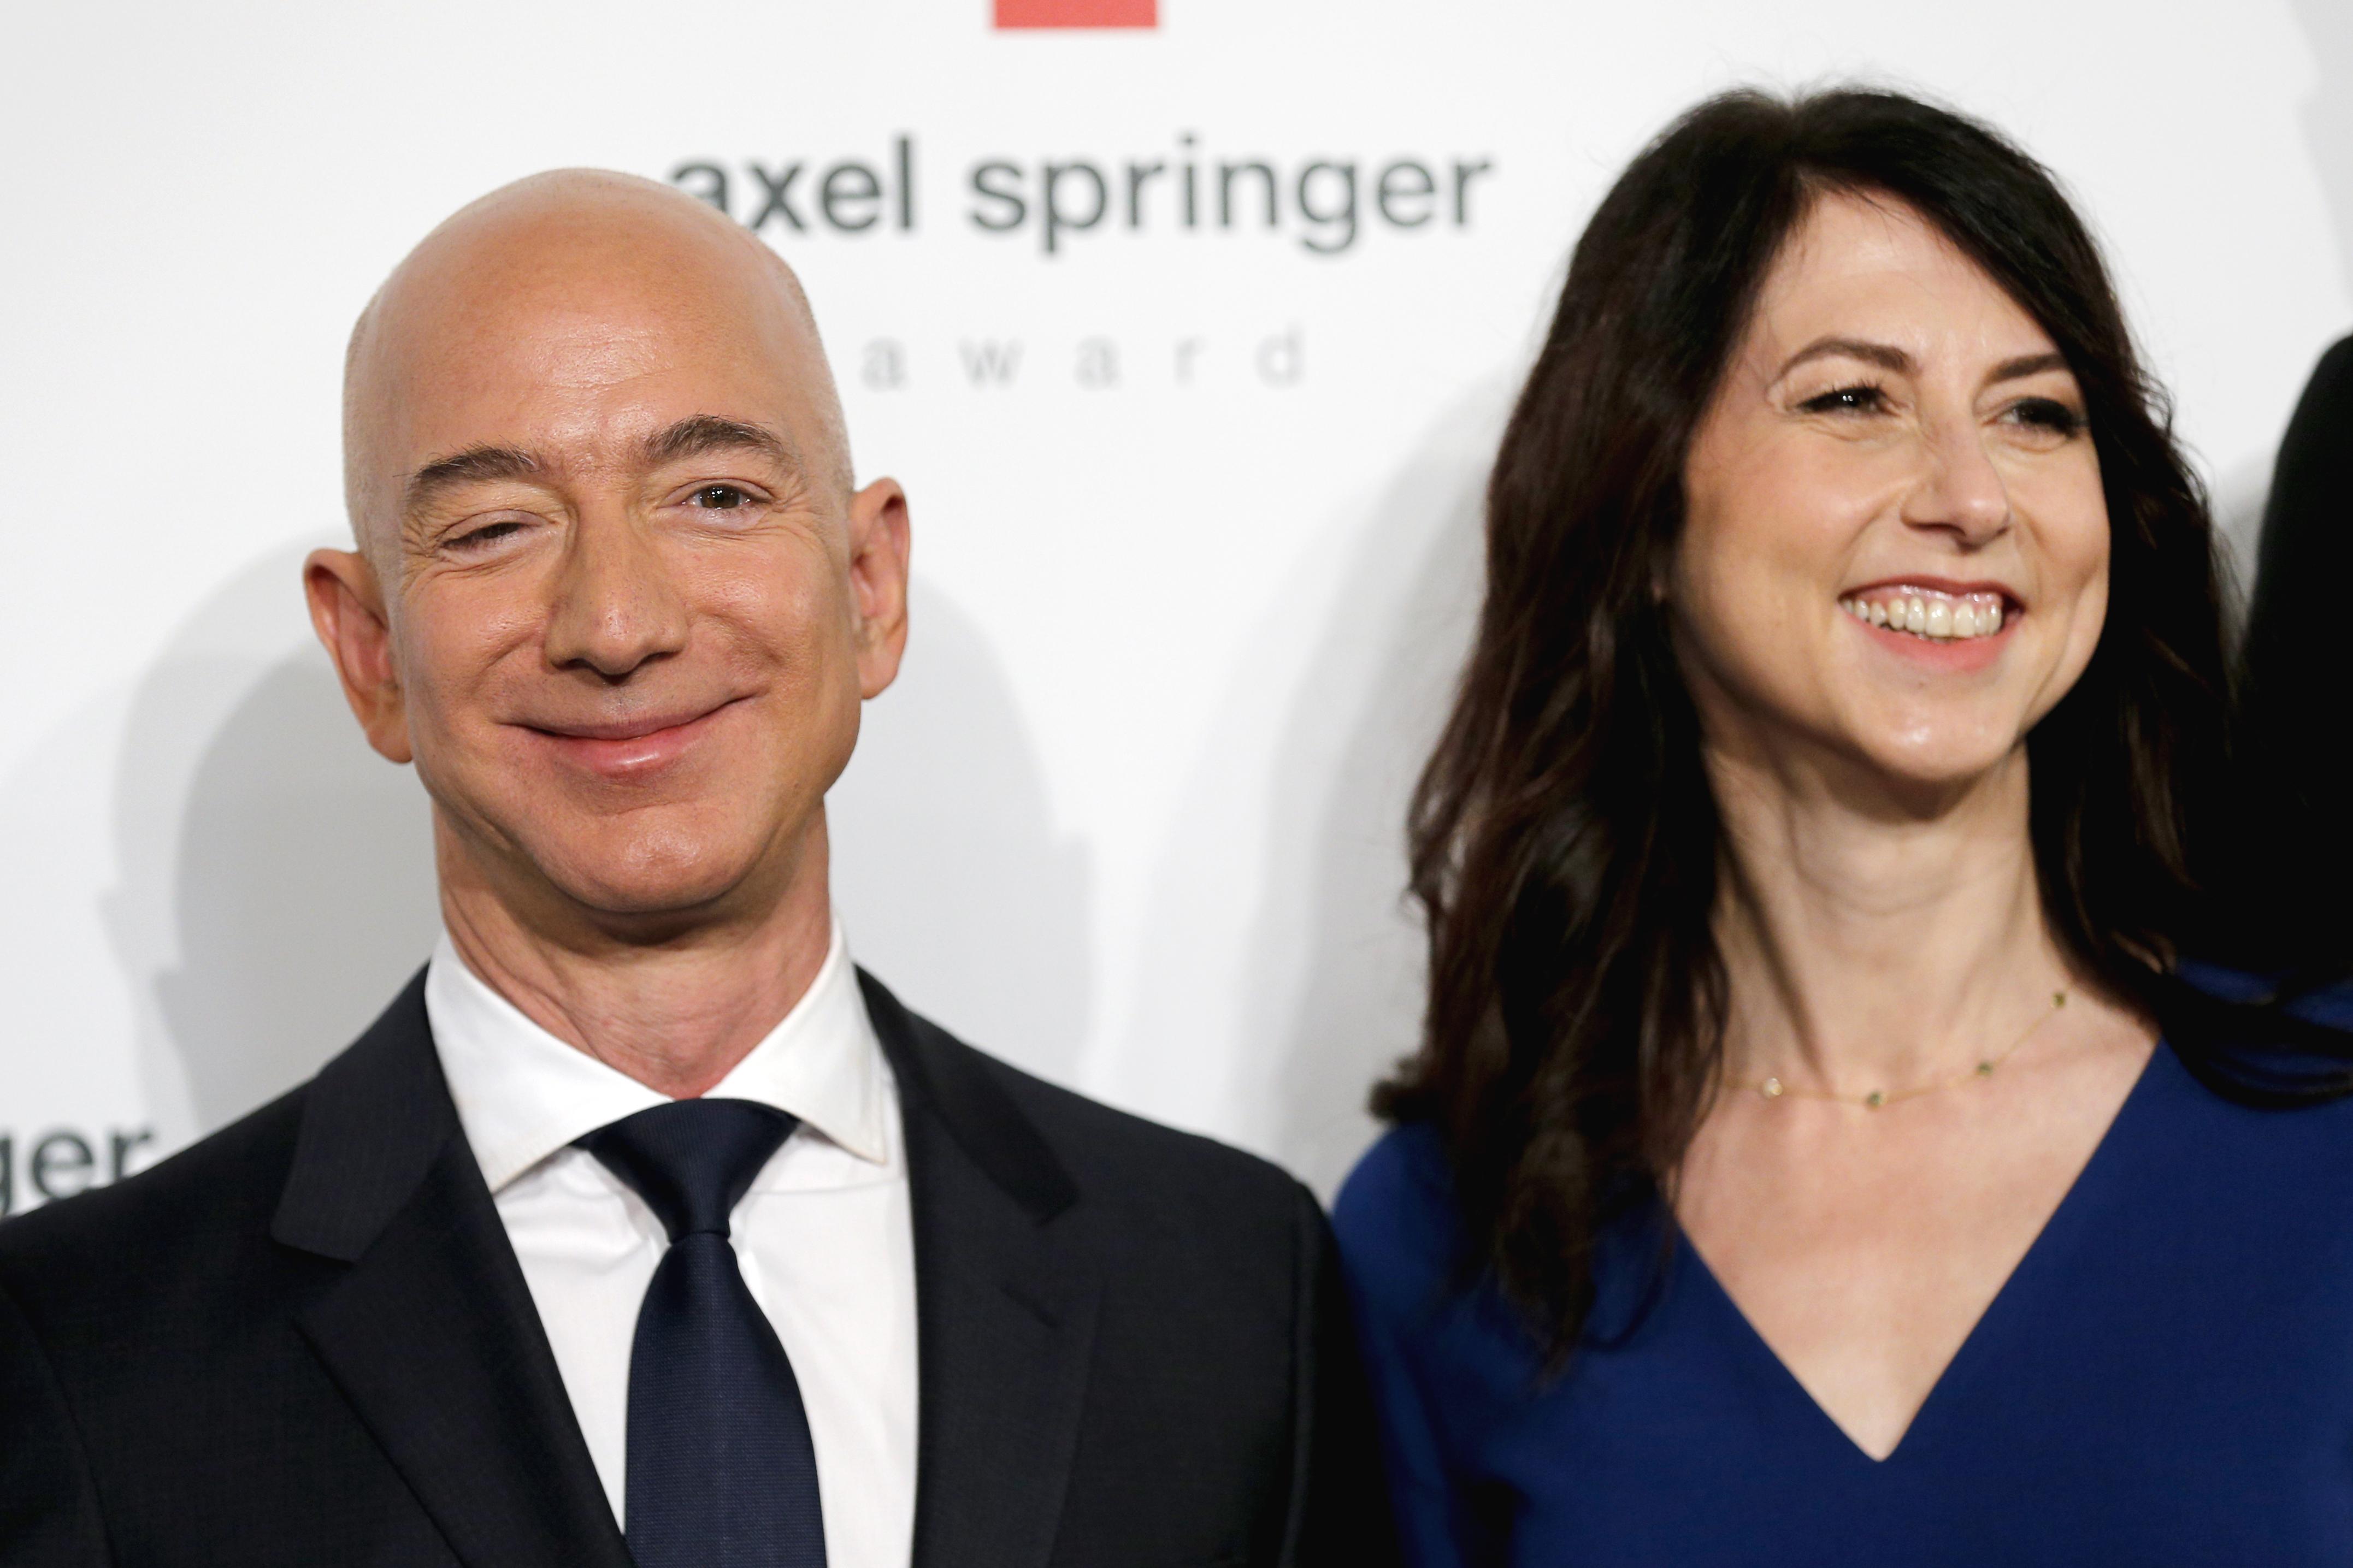 Jeff Bezos Awarded With Axel Springer Award In Berlin